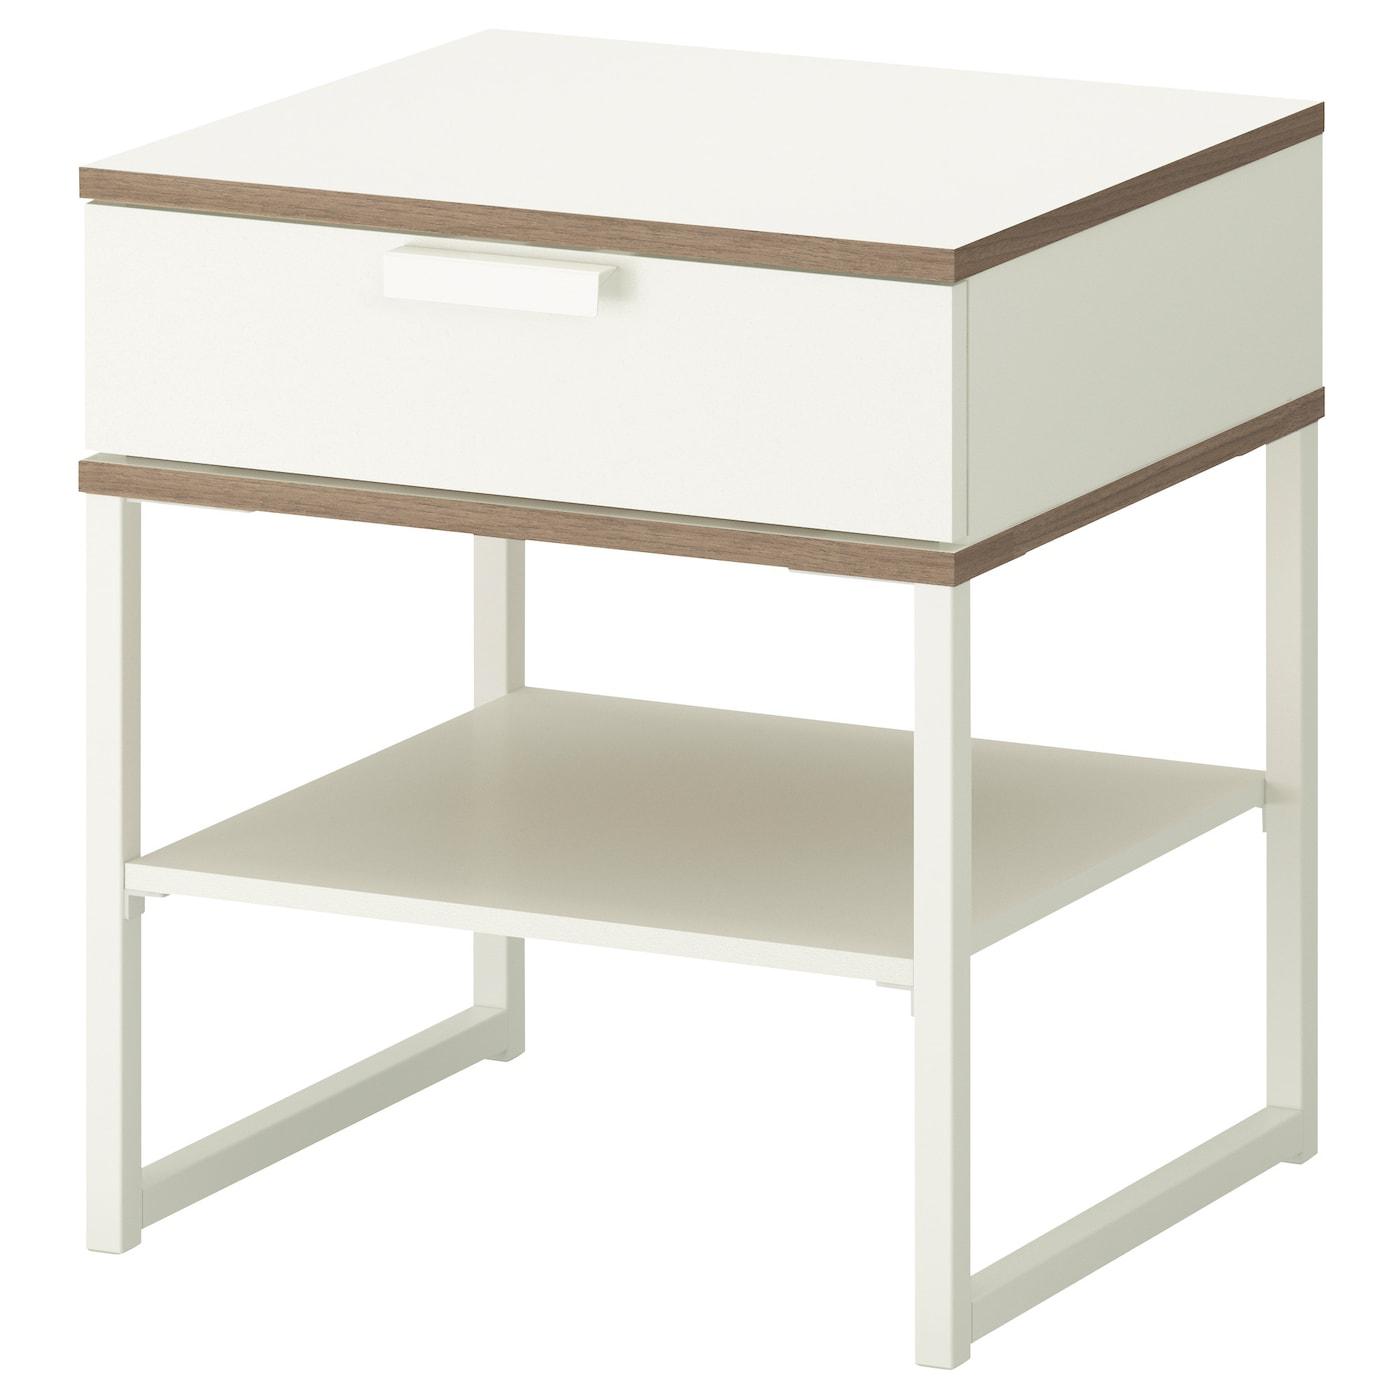 trysil table chevet blanc gris clair 45x40 cm ikea. Black Bedroom Furniture Sets. Home Design Ideas